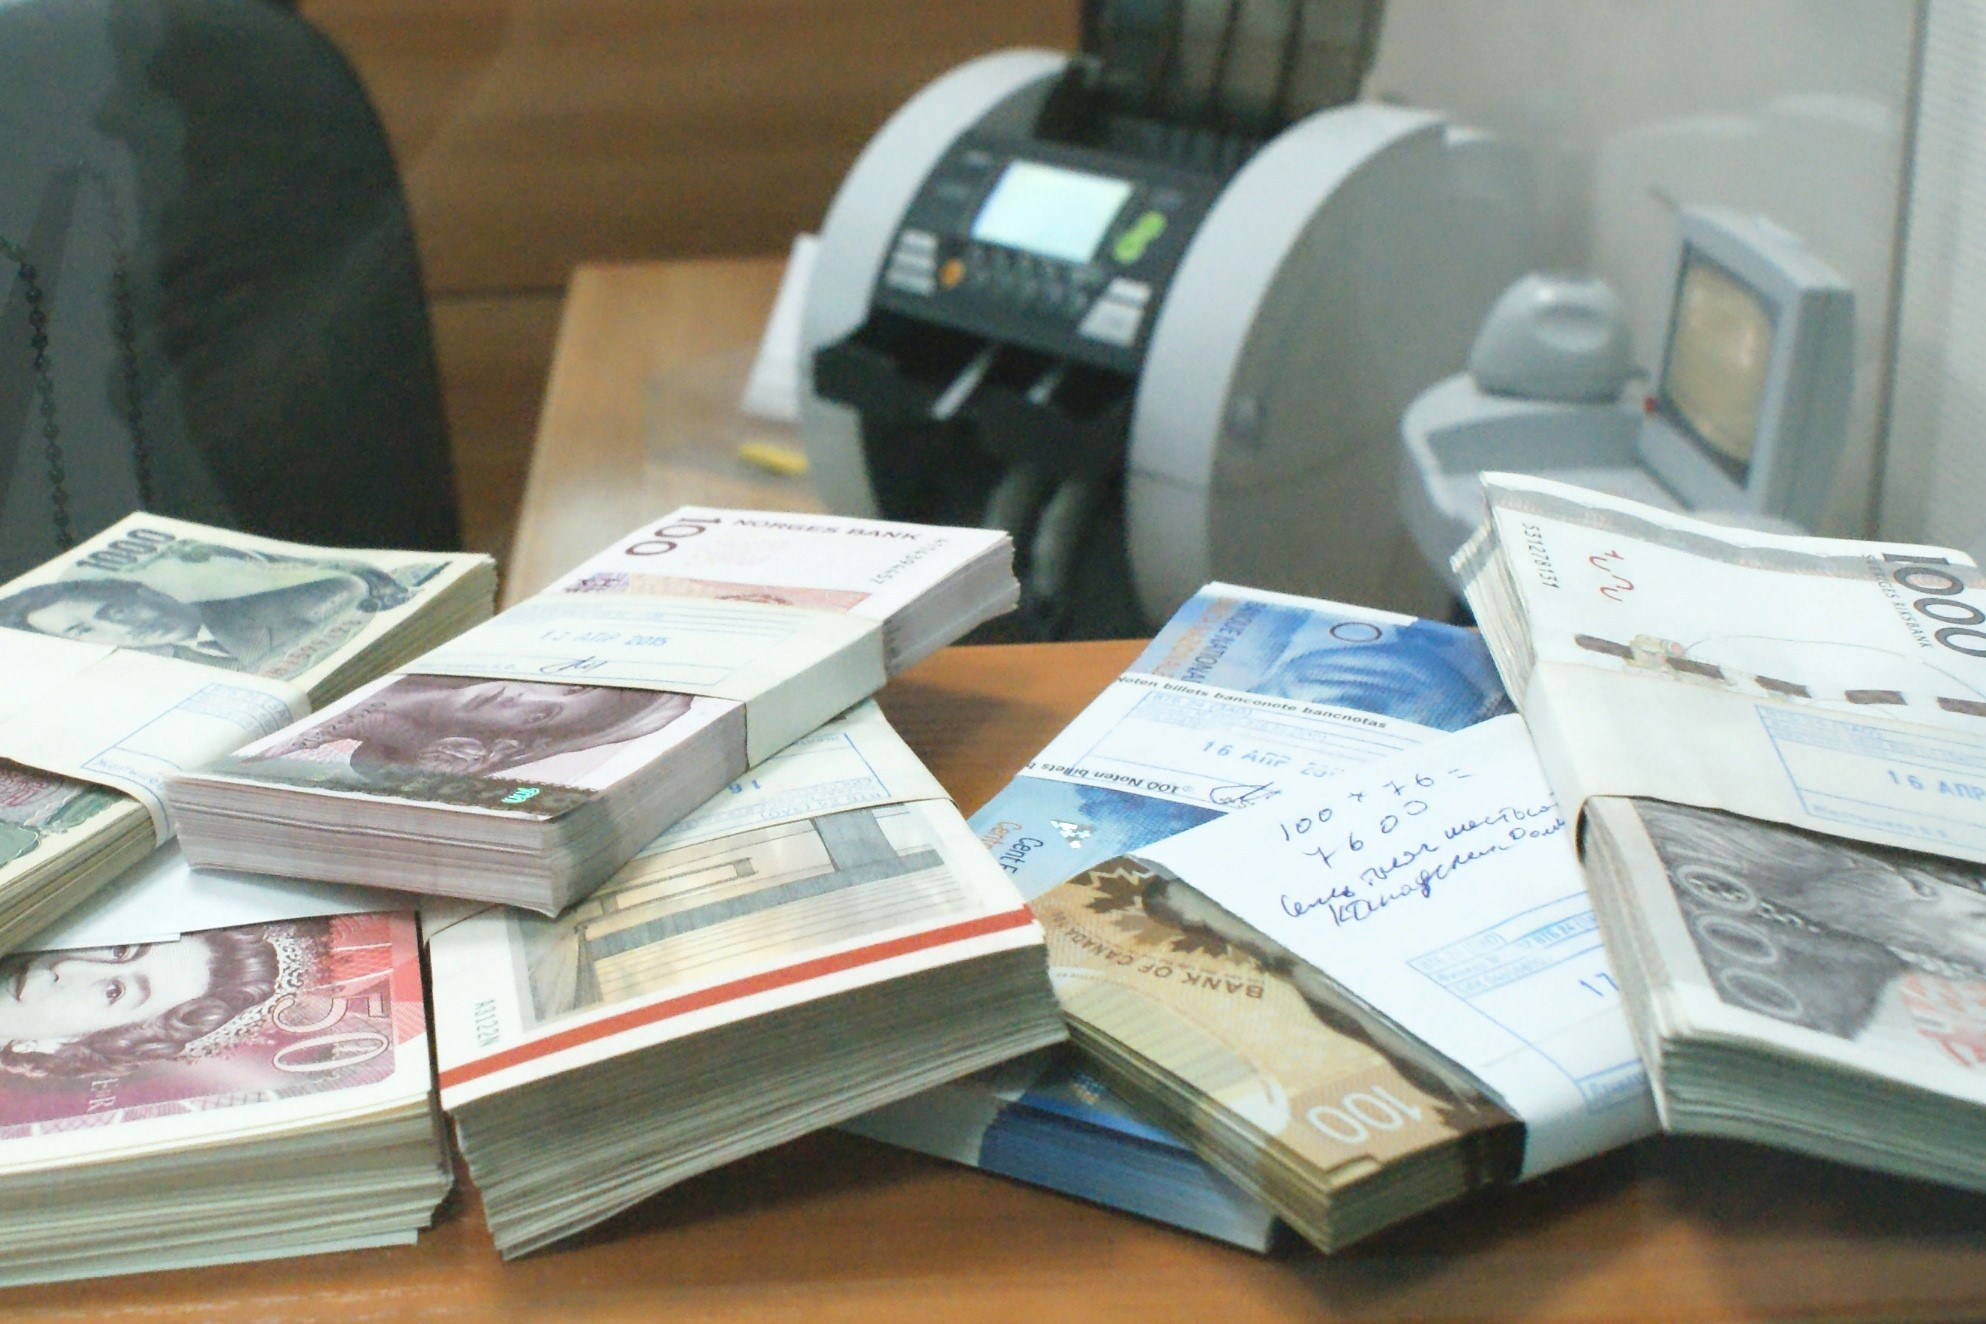 Где выгодно менять валюту? III квартал 2016 г. - «Аналитика»